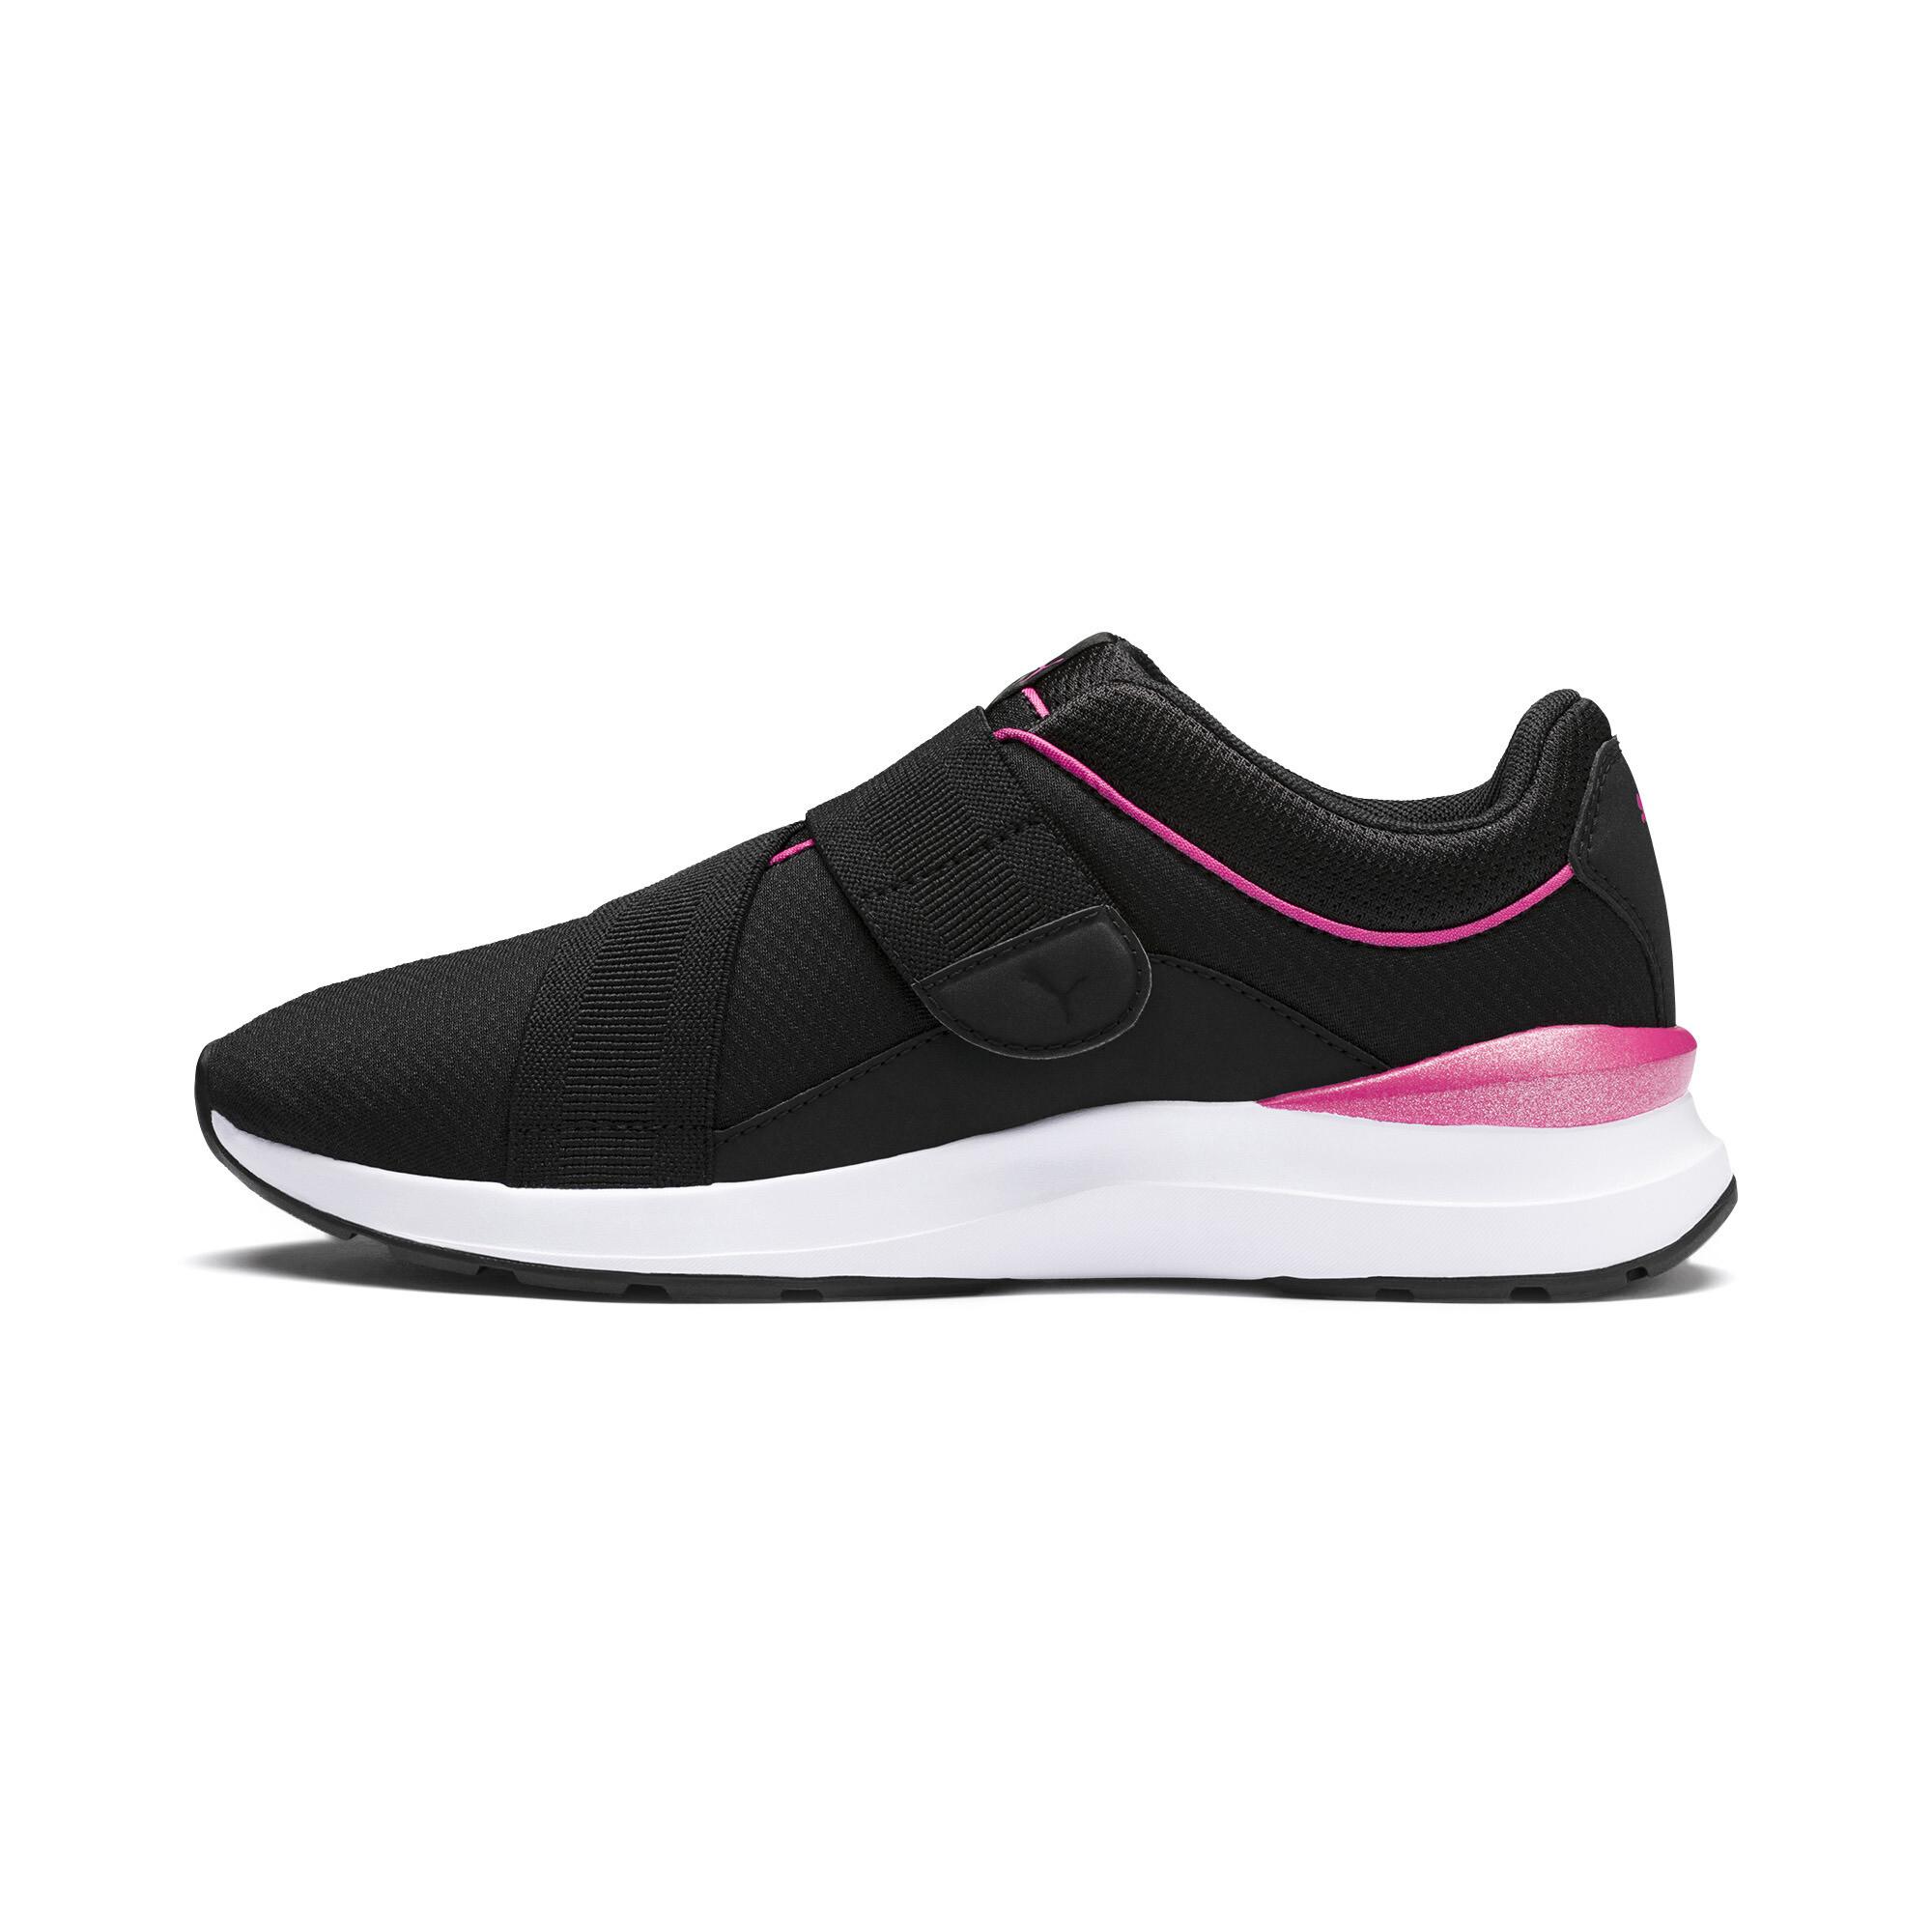 PUMA-Adela-X-Women-s-Sneakers-Women-Shoe-Basics thumbnail 9